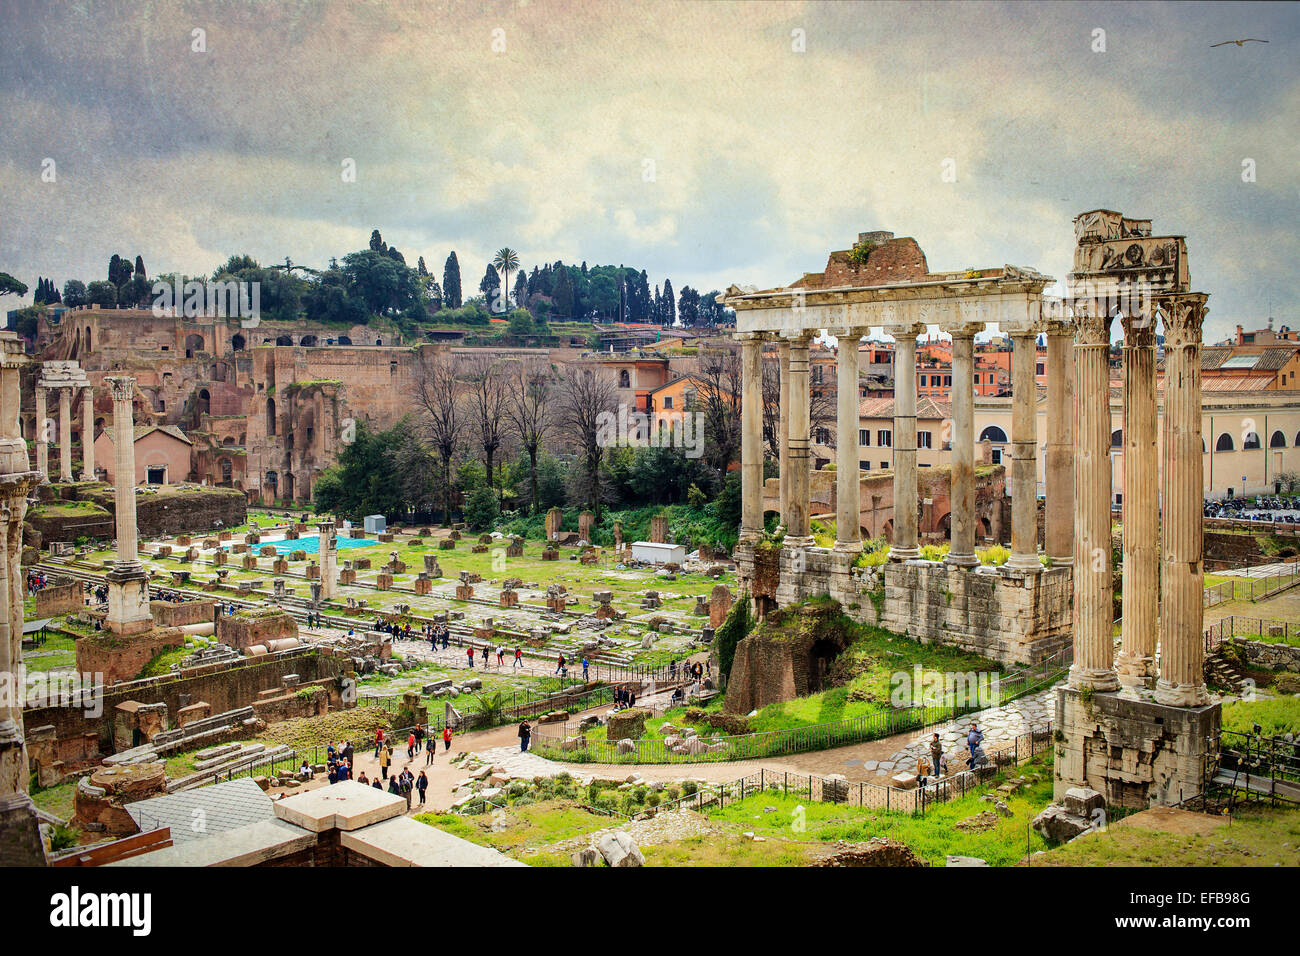 Foro Romano - old roman monuments ruins in Rome, Italy - Stock Image